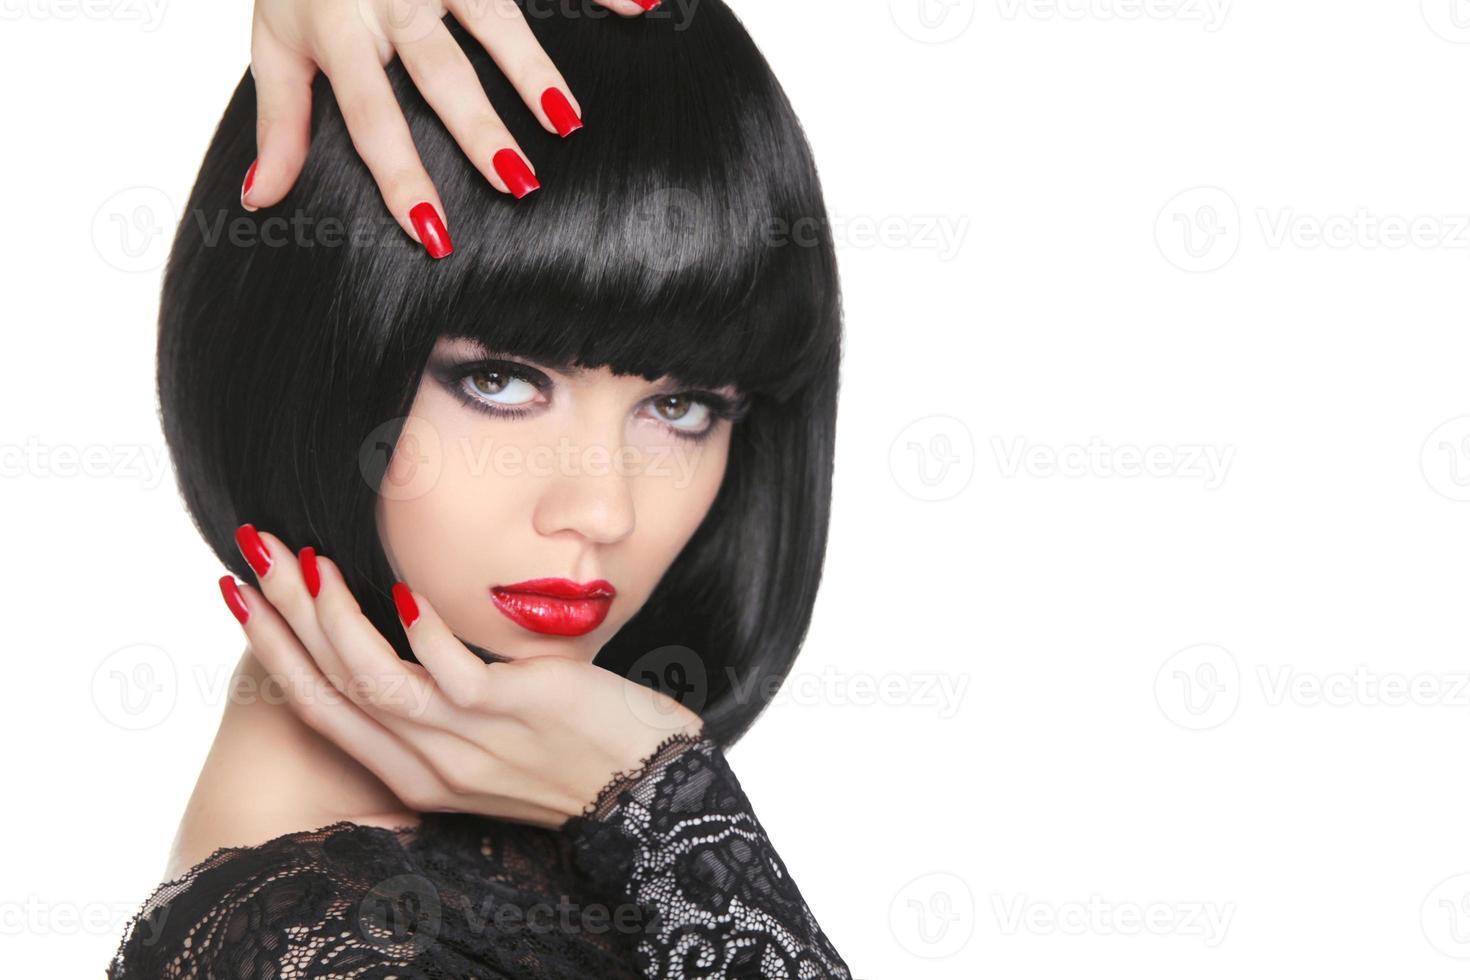 Manicured nails. Beauty girl portrait. Red lips. Back short bob photo